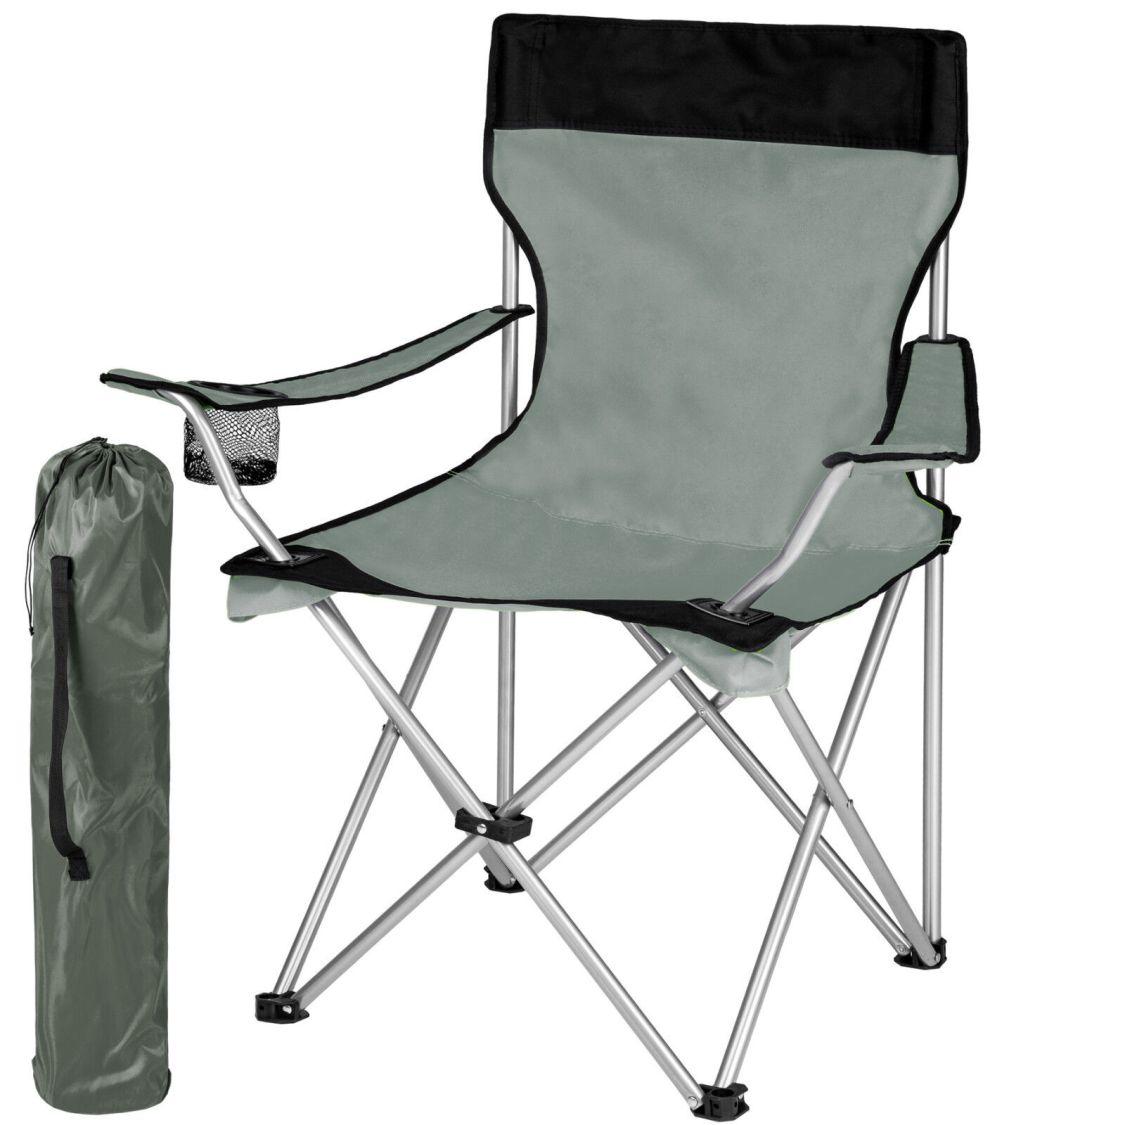 Campingstuhl mit hoher Lehne Klappstuhl Regiestuhl Anglerstuhl Gartenstuhl grau